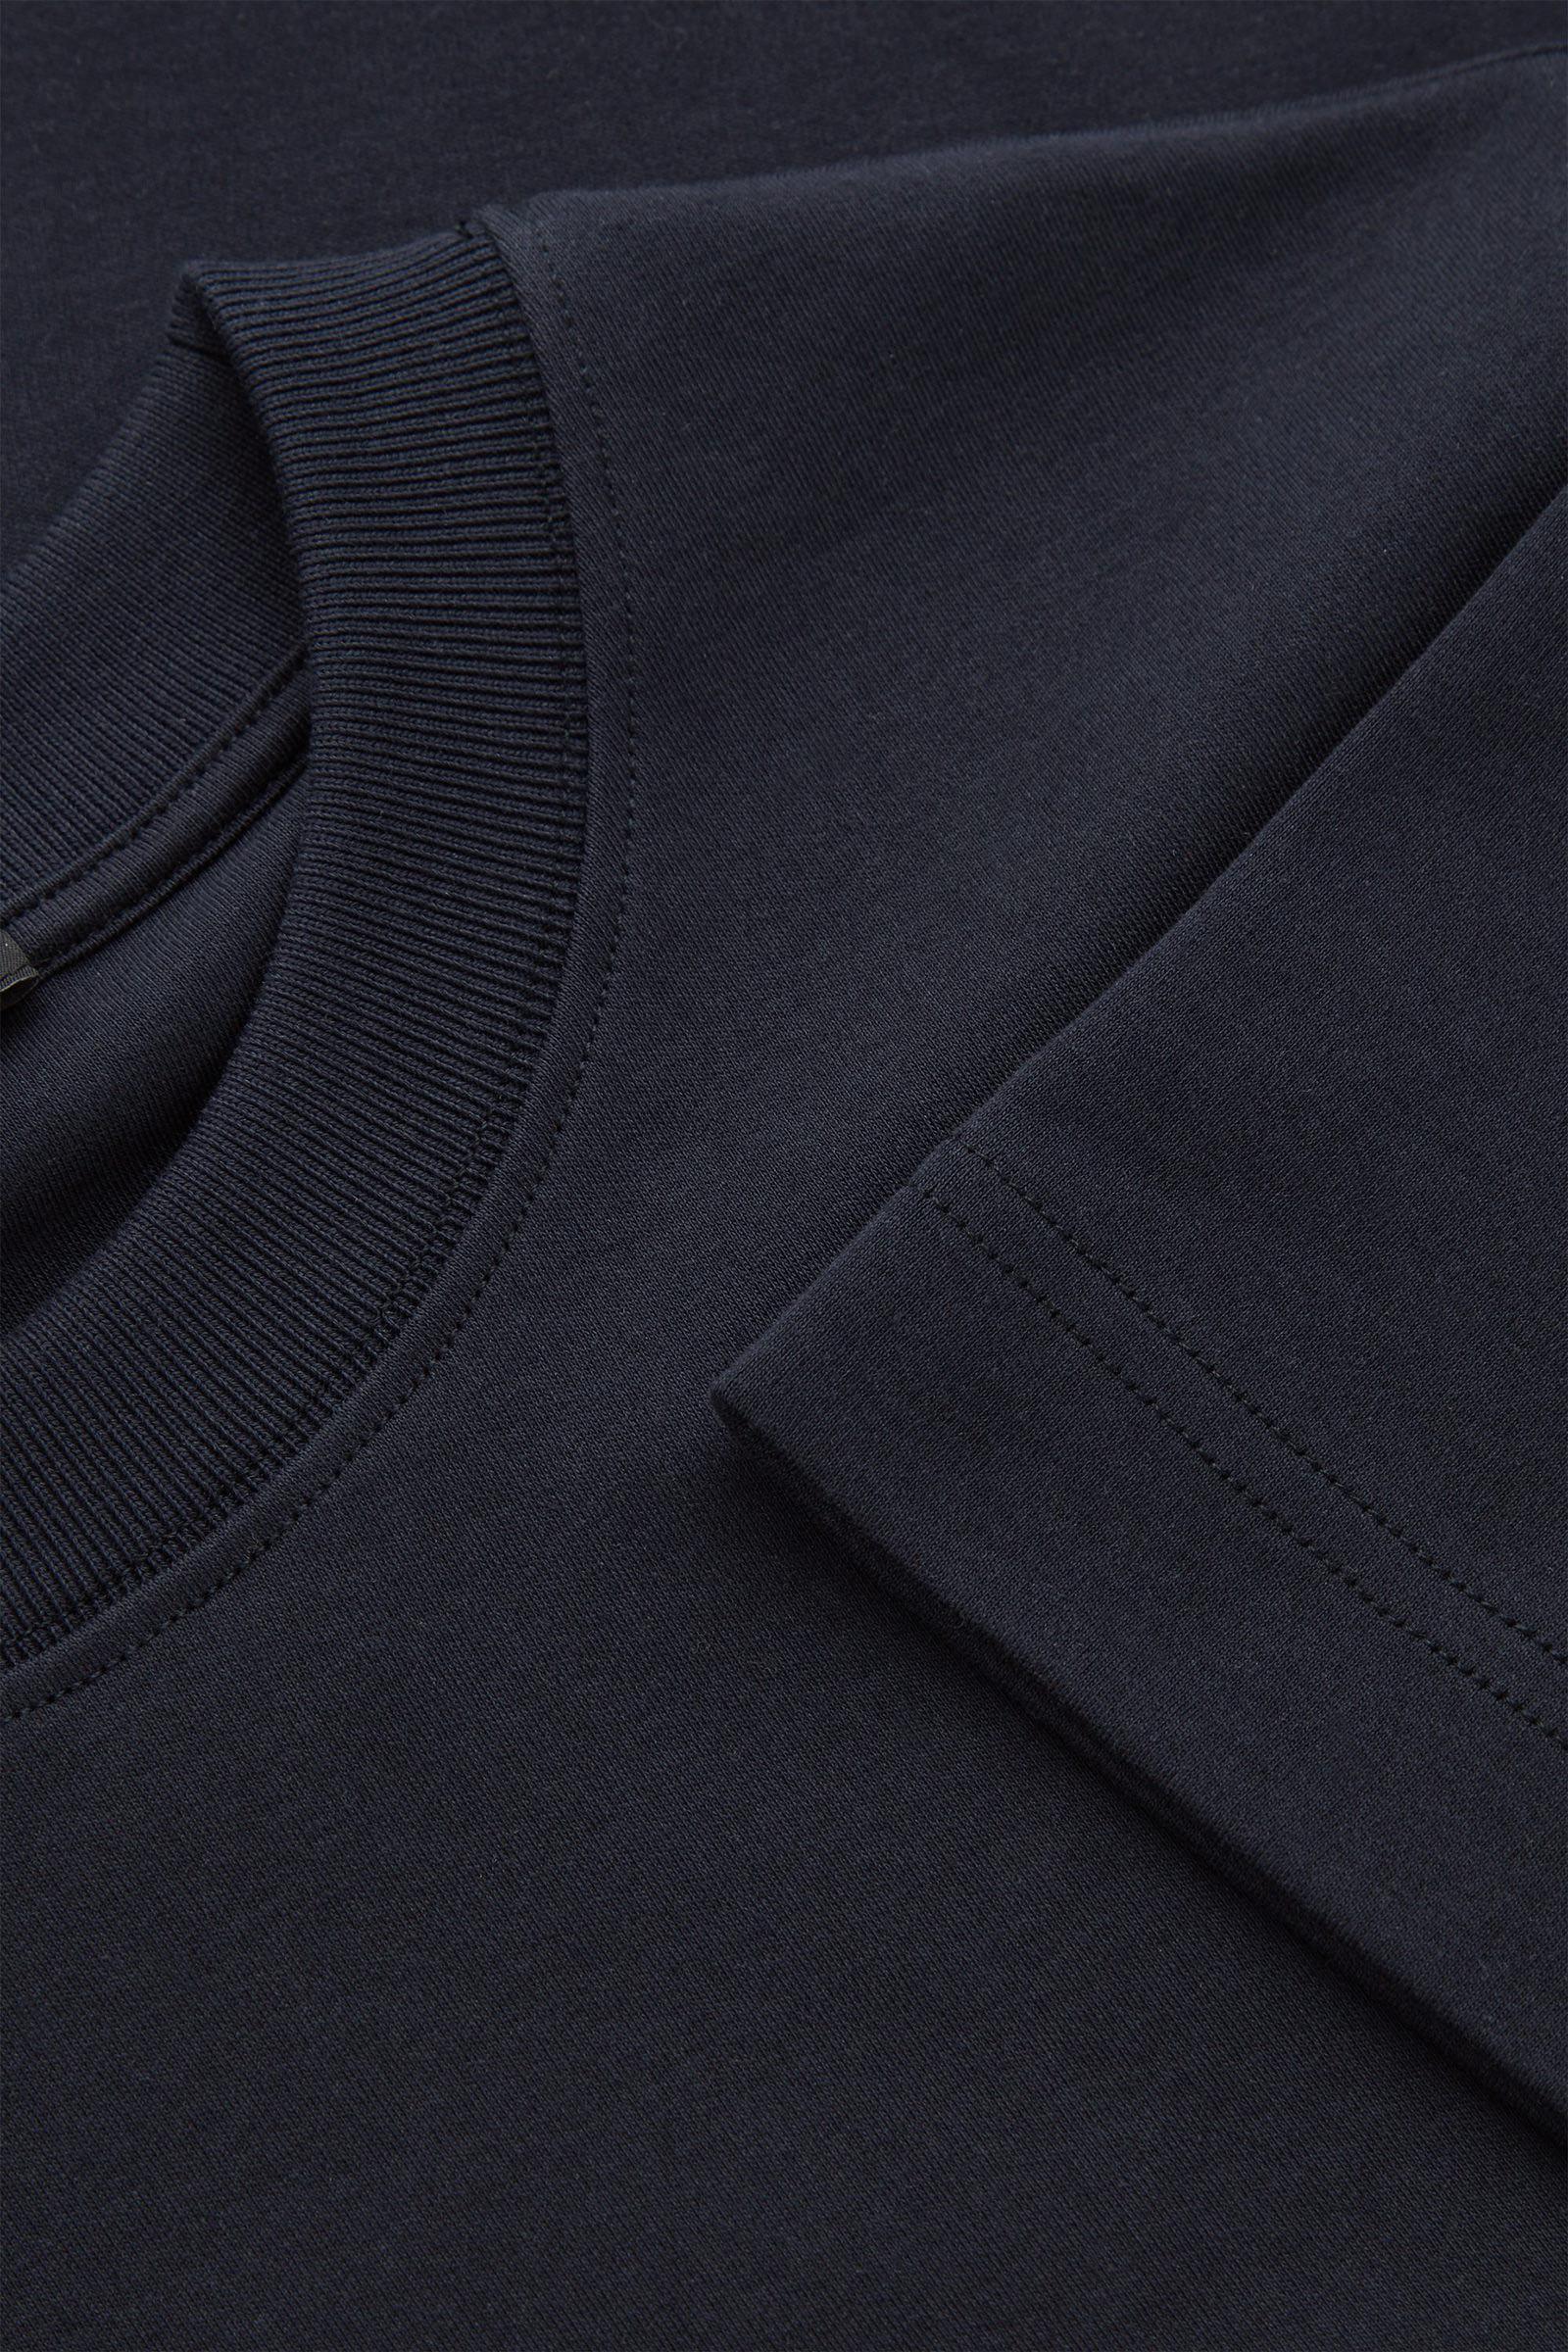 COS 슬림 핏 티셔츠의 블루컬러 Detail입니다.